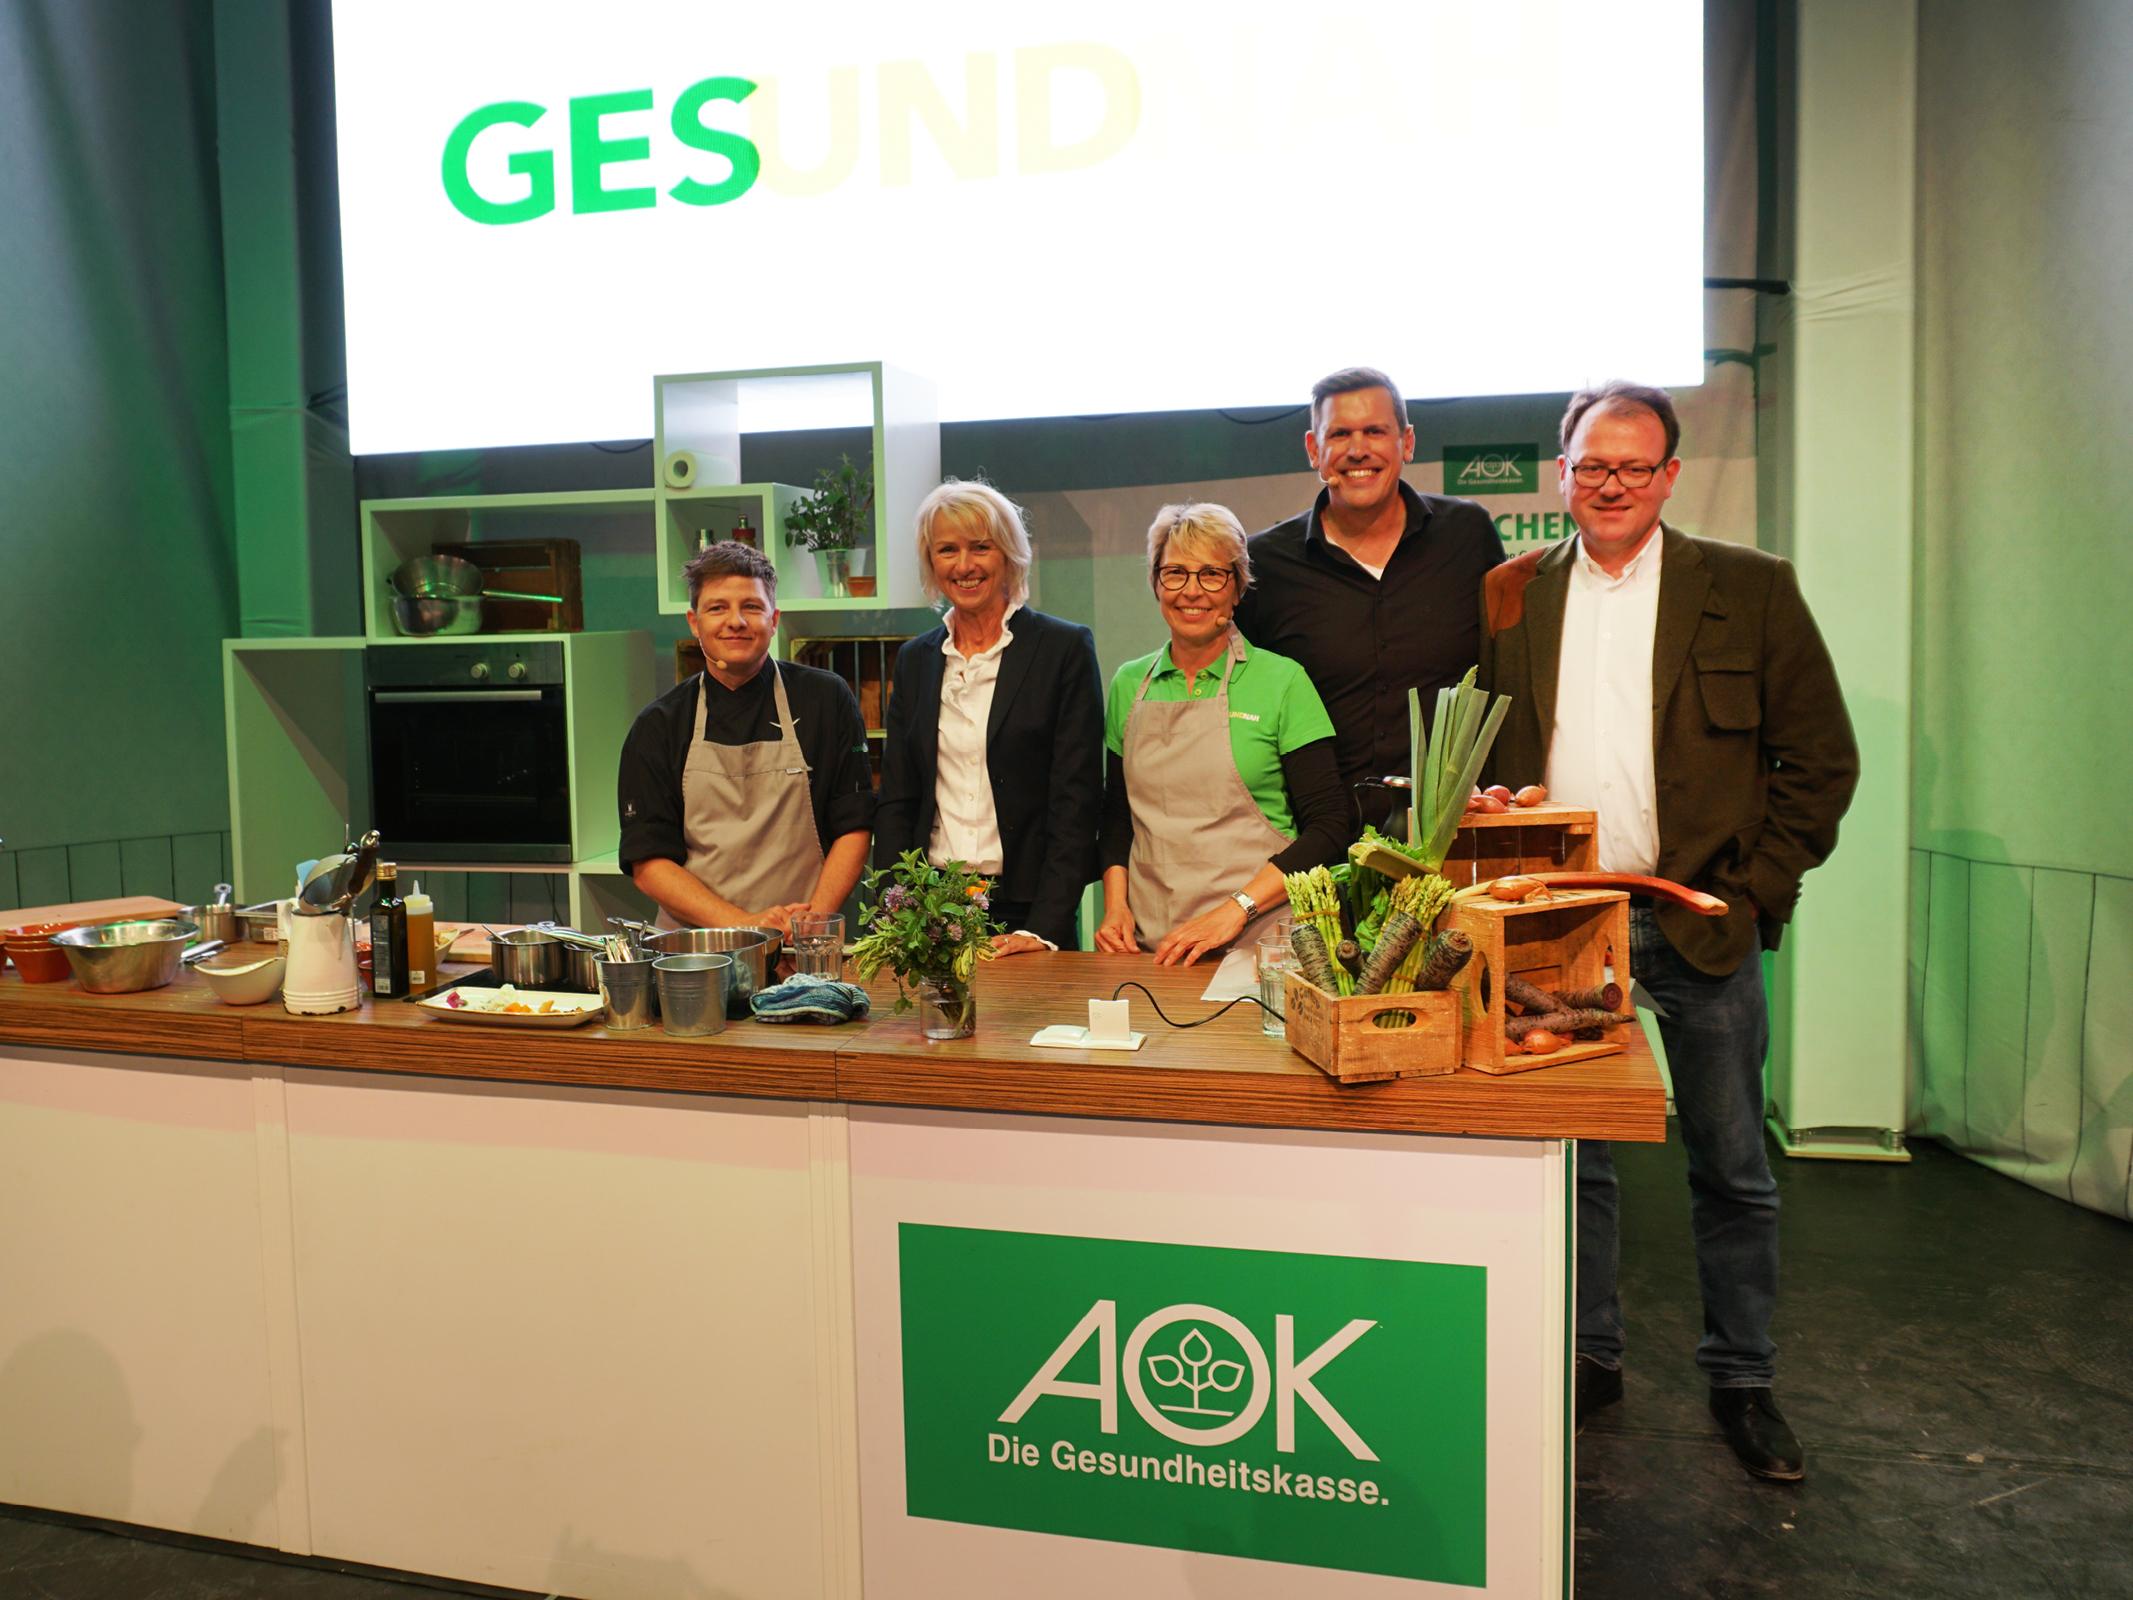 Ganz nah dran am Genuss – AOK Kochshow und Teusser Mineralbrunnen auf der BUGA Heilbronn